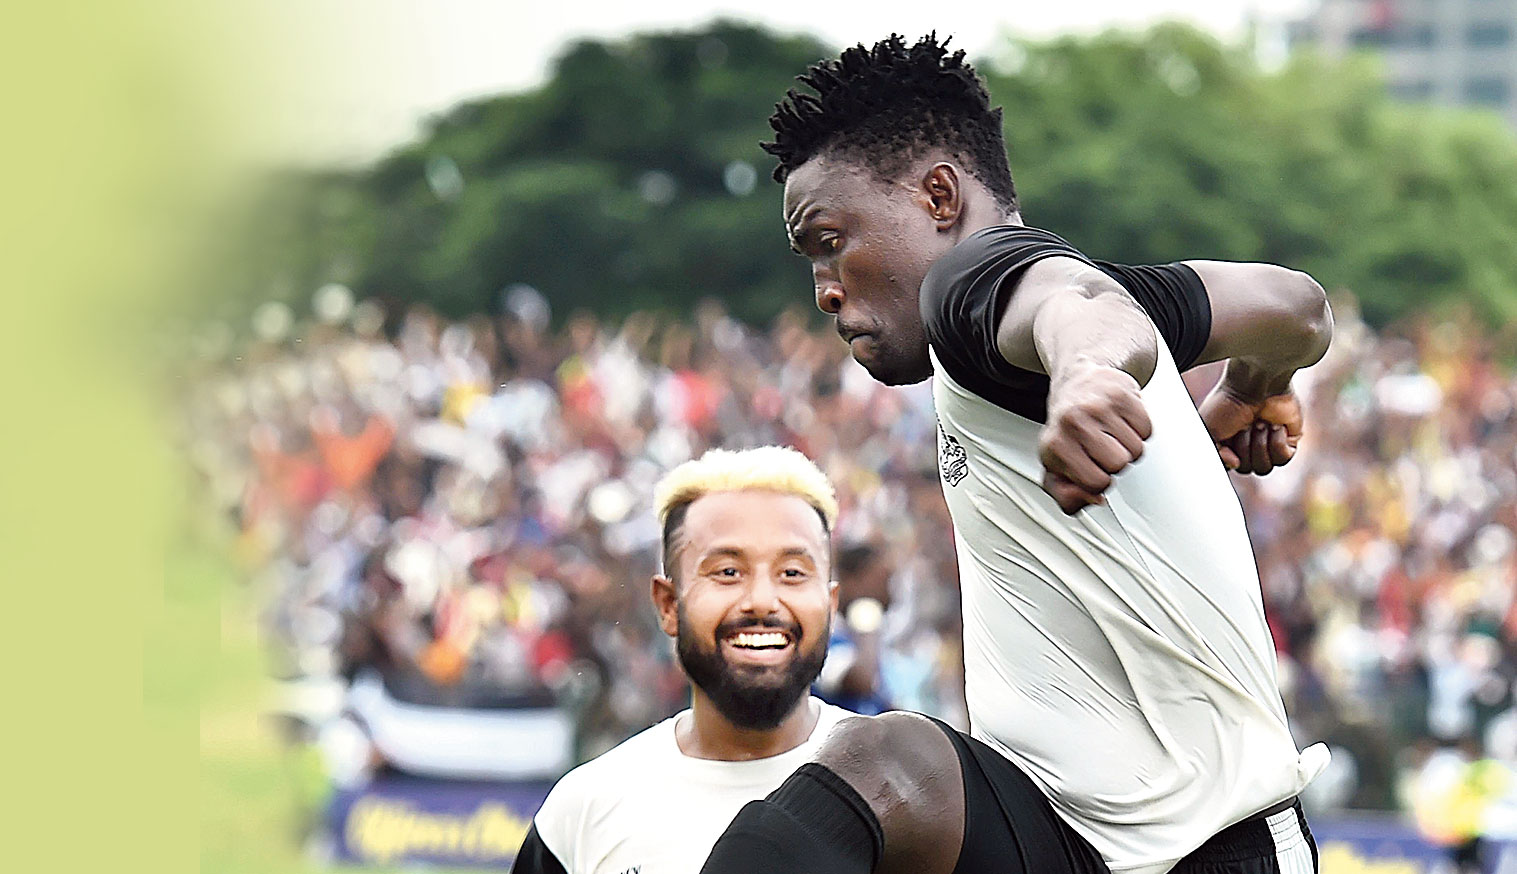 Kareem Omoloja of Mohammedan Sporting celebrates as Tirthankar Sarkar joins in after the former scored the first goal against Peerless SC on Monday.